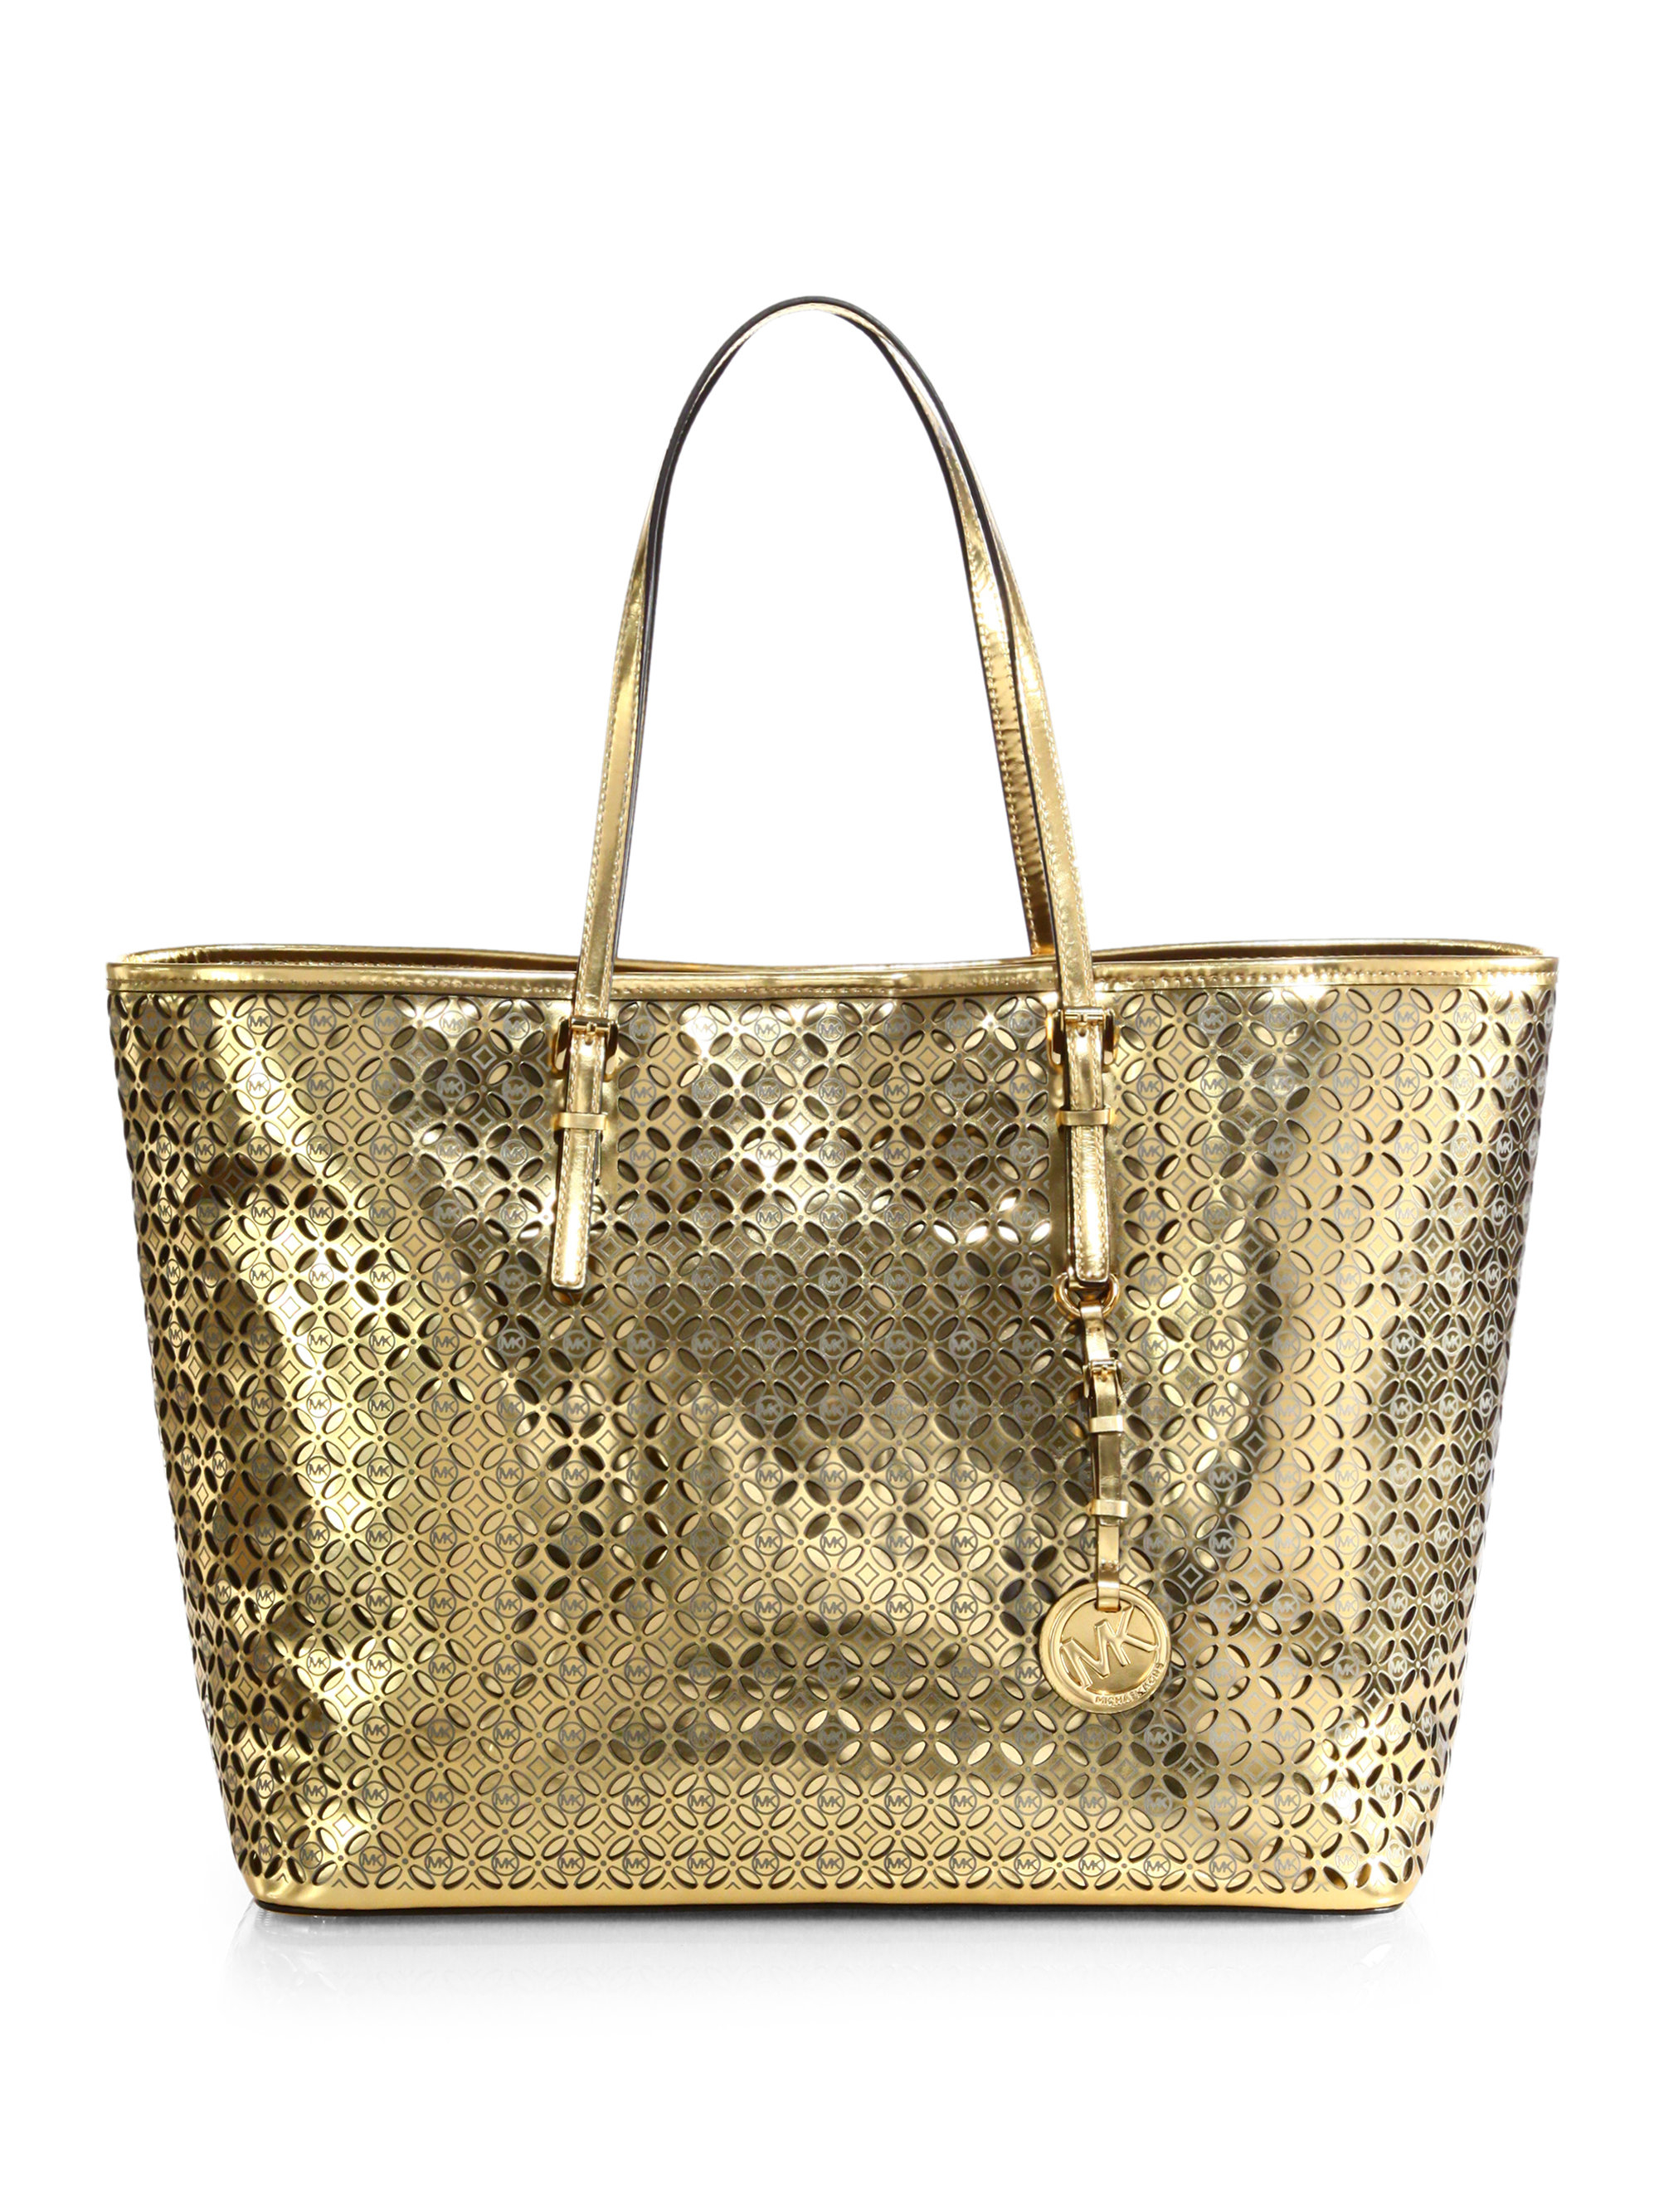 a115a62f348e michael kors gold flower bag relogio 2280 - Marwood VeneerMarwood Veneer